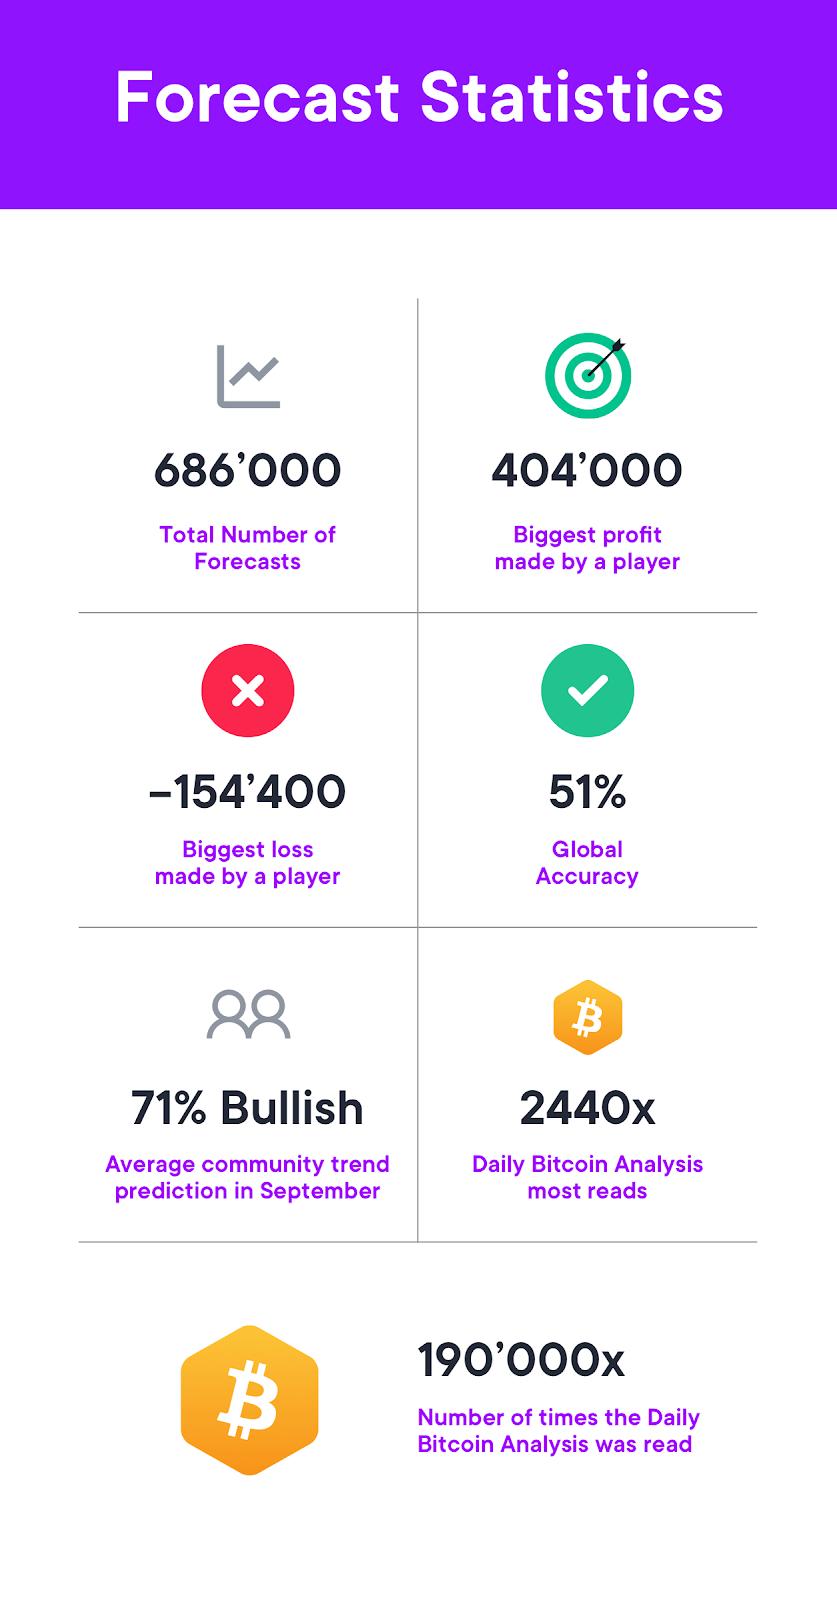 SwissBorg Community App forecast statistics